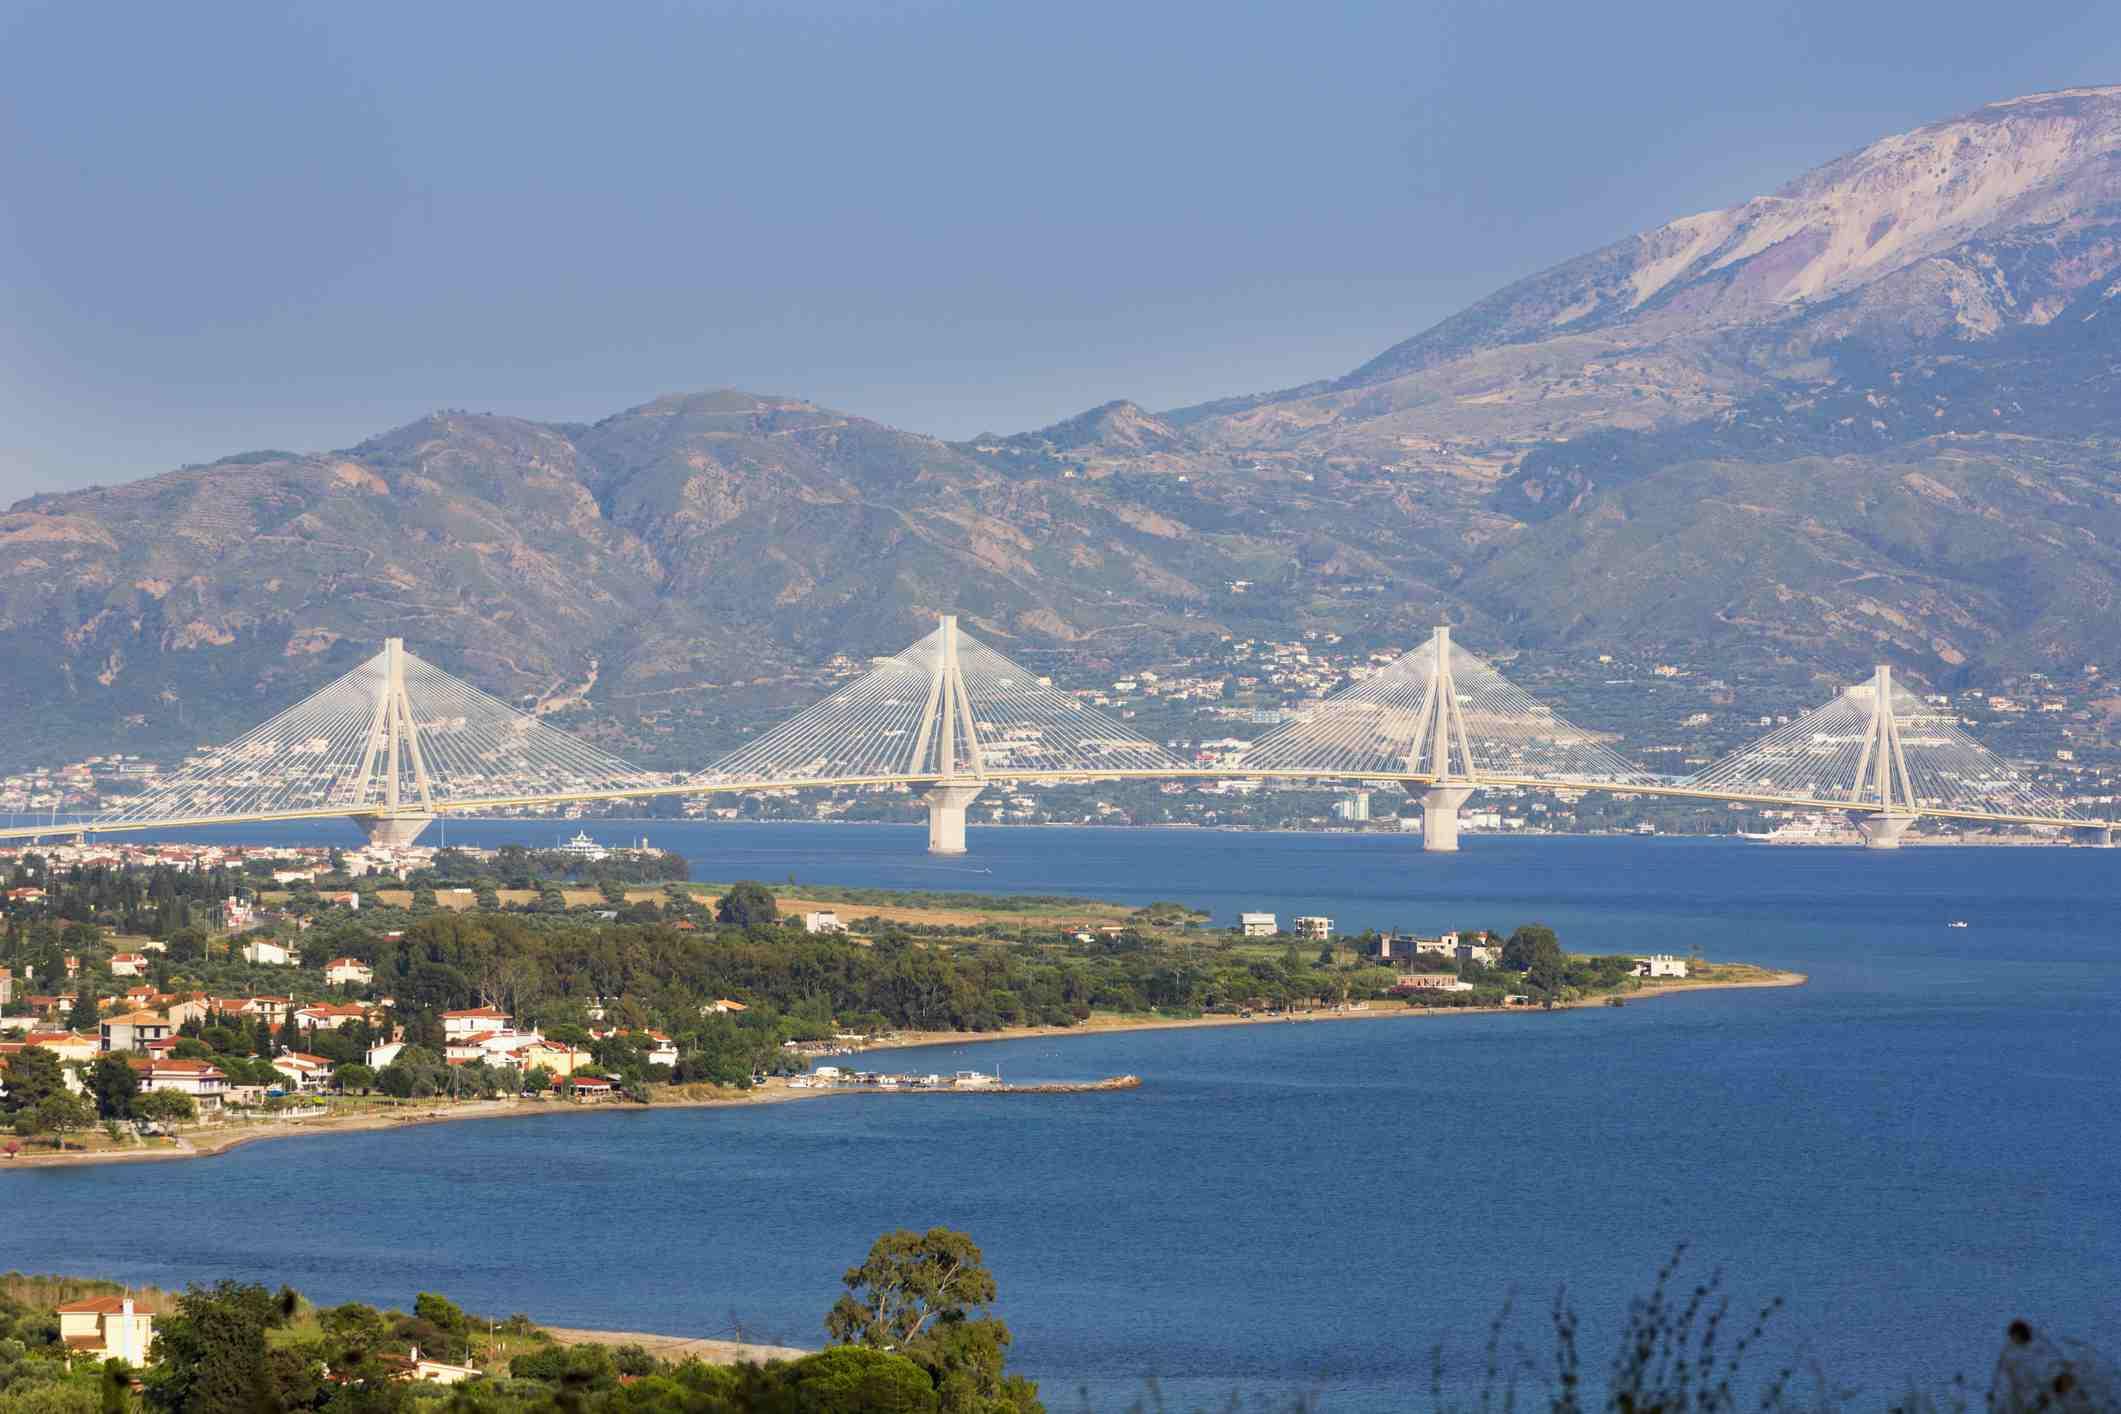 Rio-Antirron Bridge